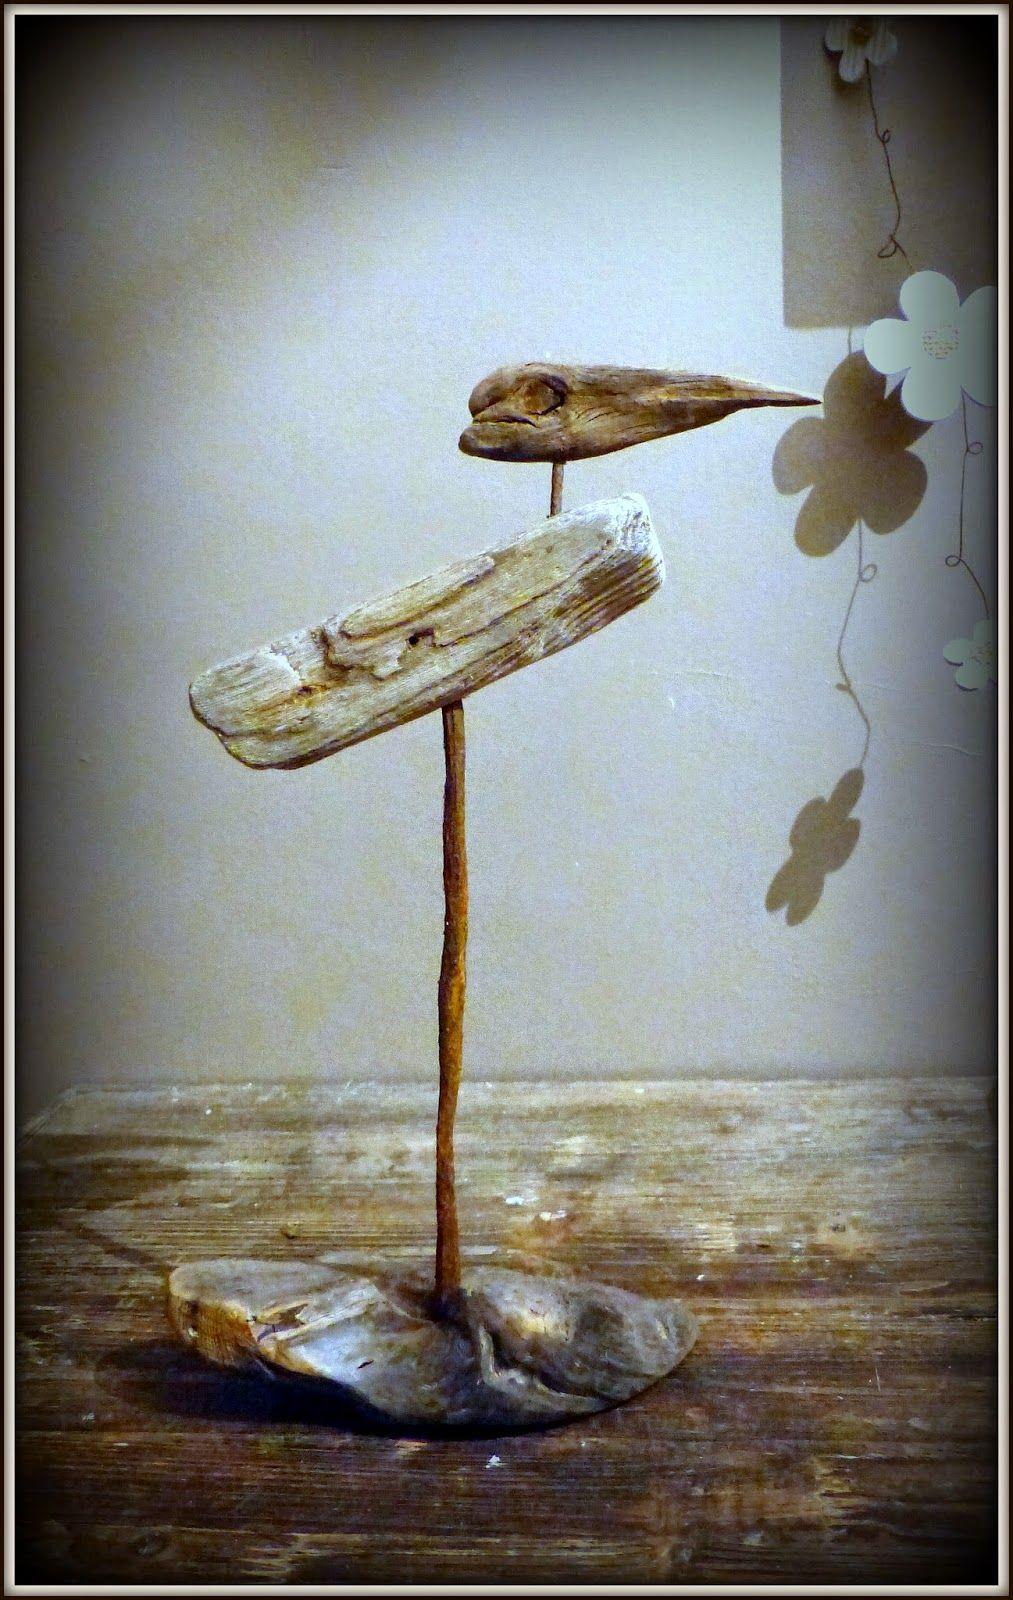 oiseau bois flott driftwood bird cr ations mutoz inc. Black Bedroom Furniture Sets. Home Design Ideas